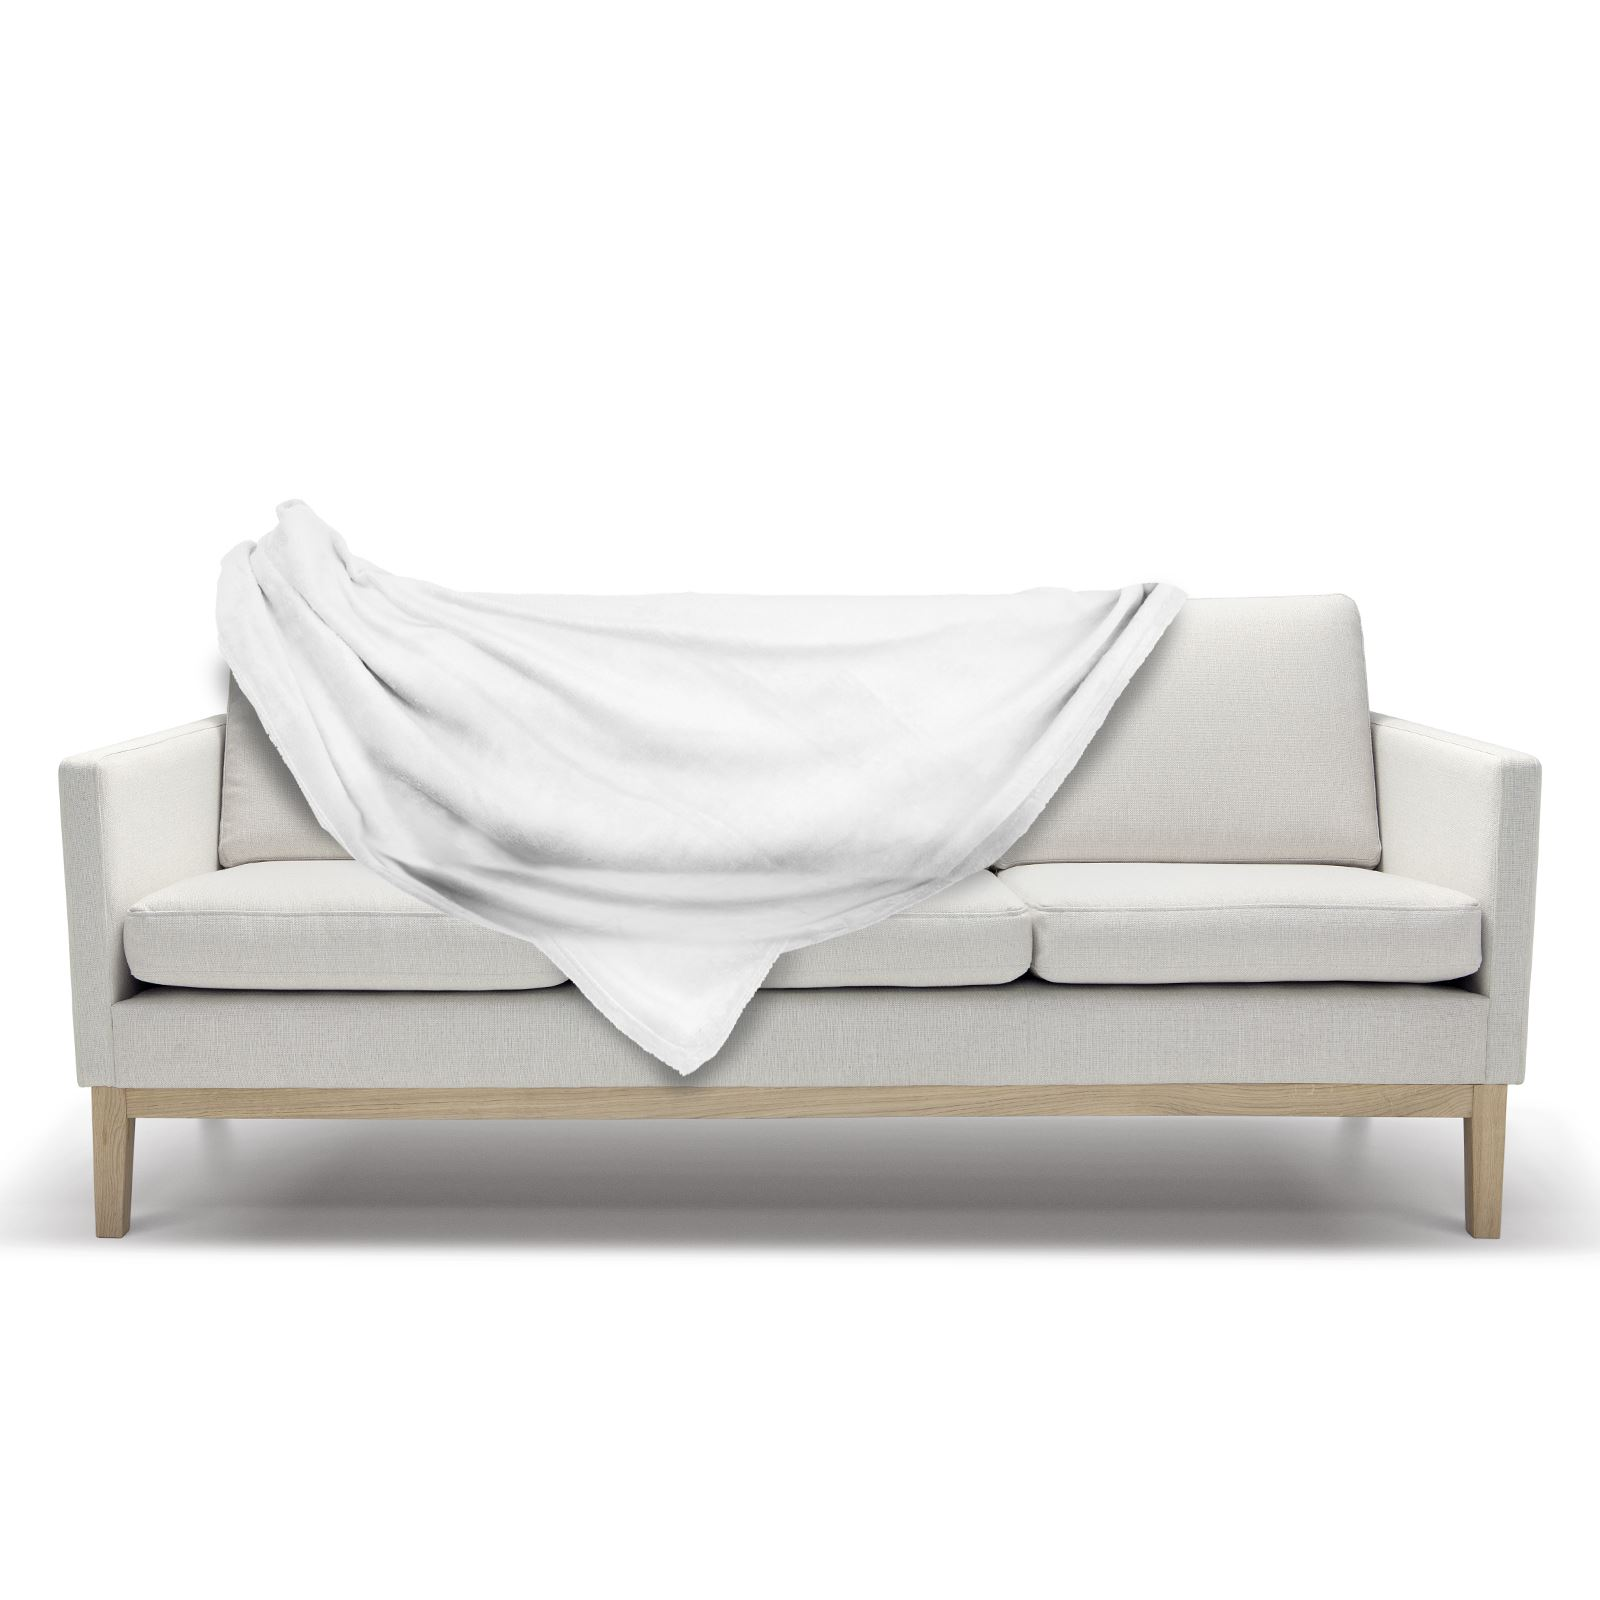 Luxury Super Soft Velvet Flannel Fleece Blanket Throw Warm Cover